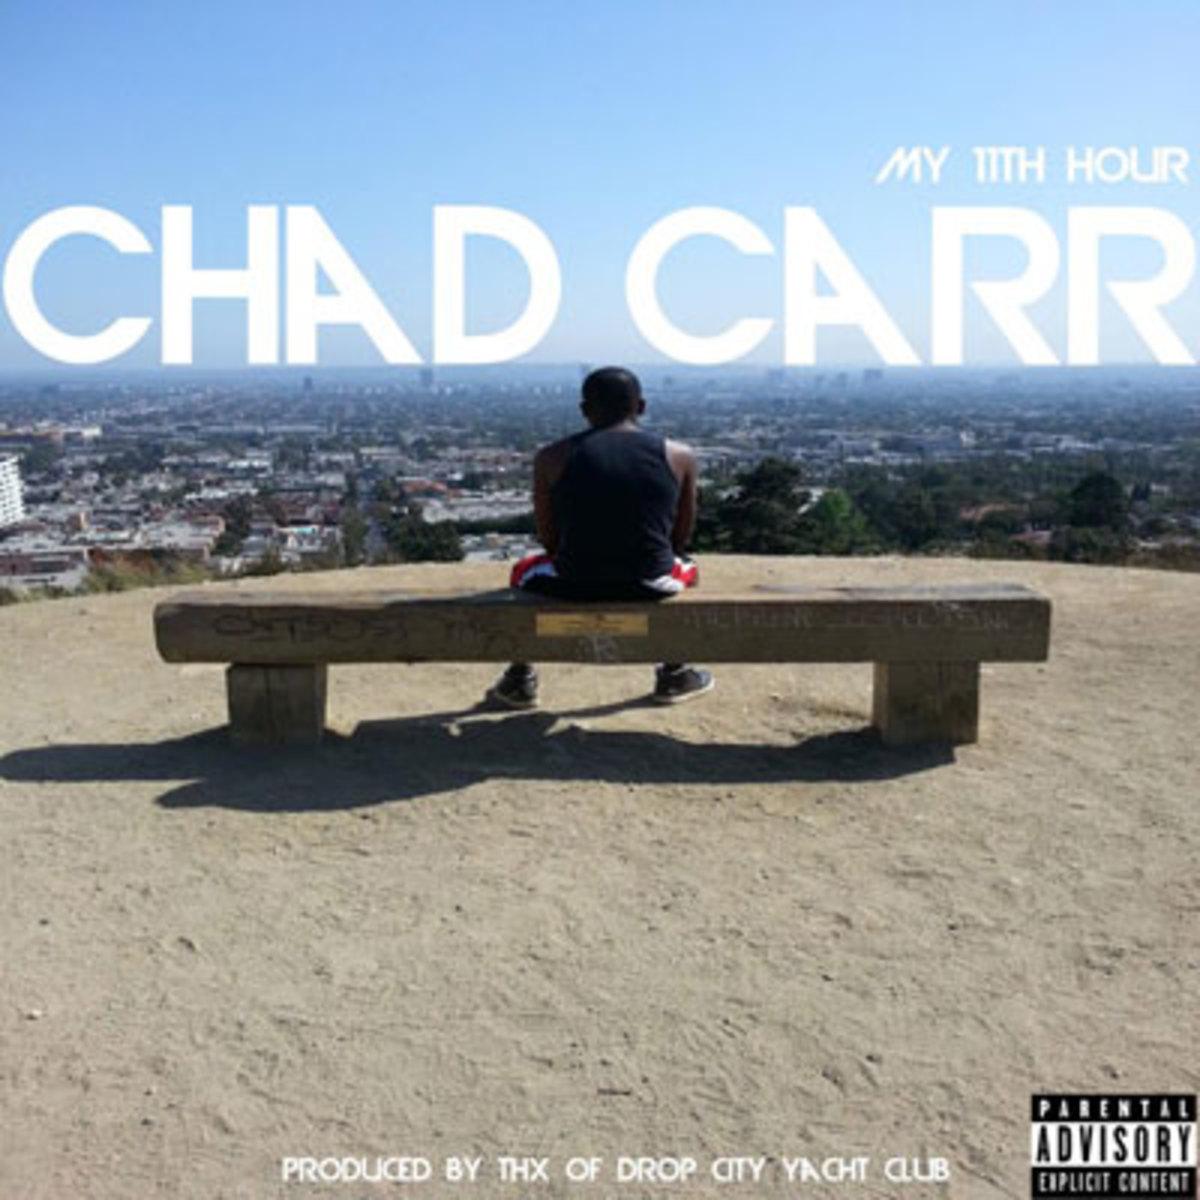 chadcarr-my11hour.jpg